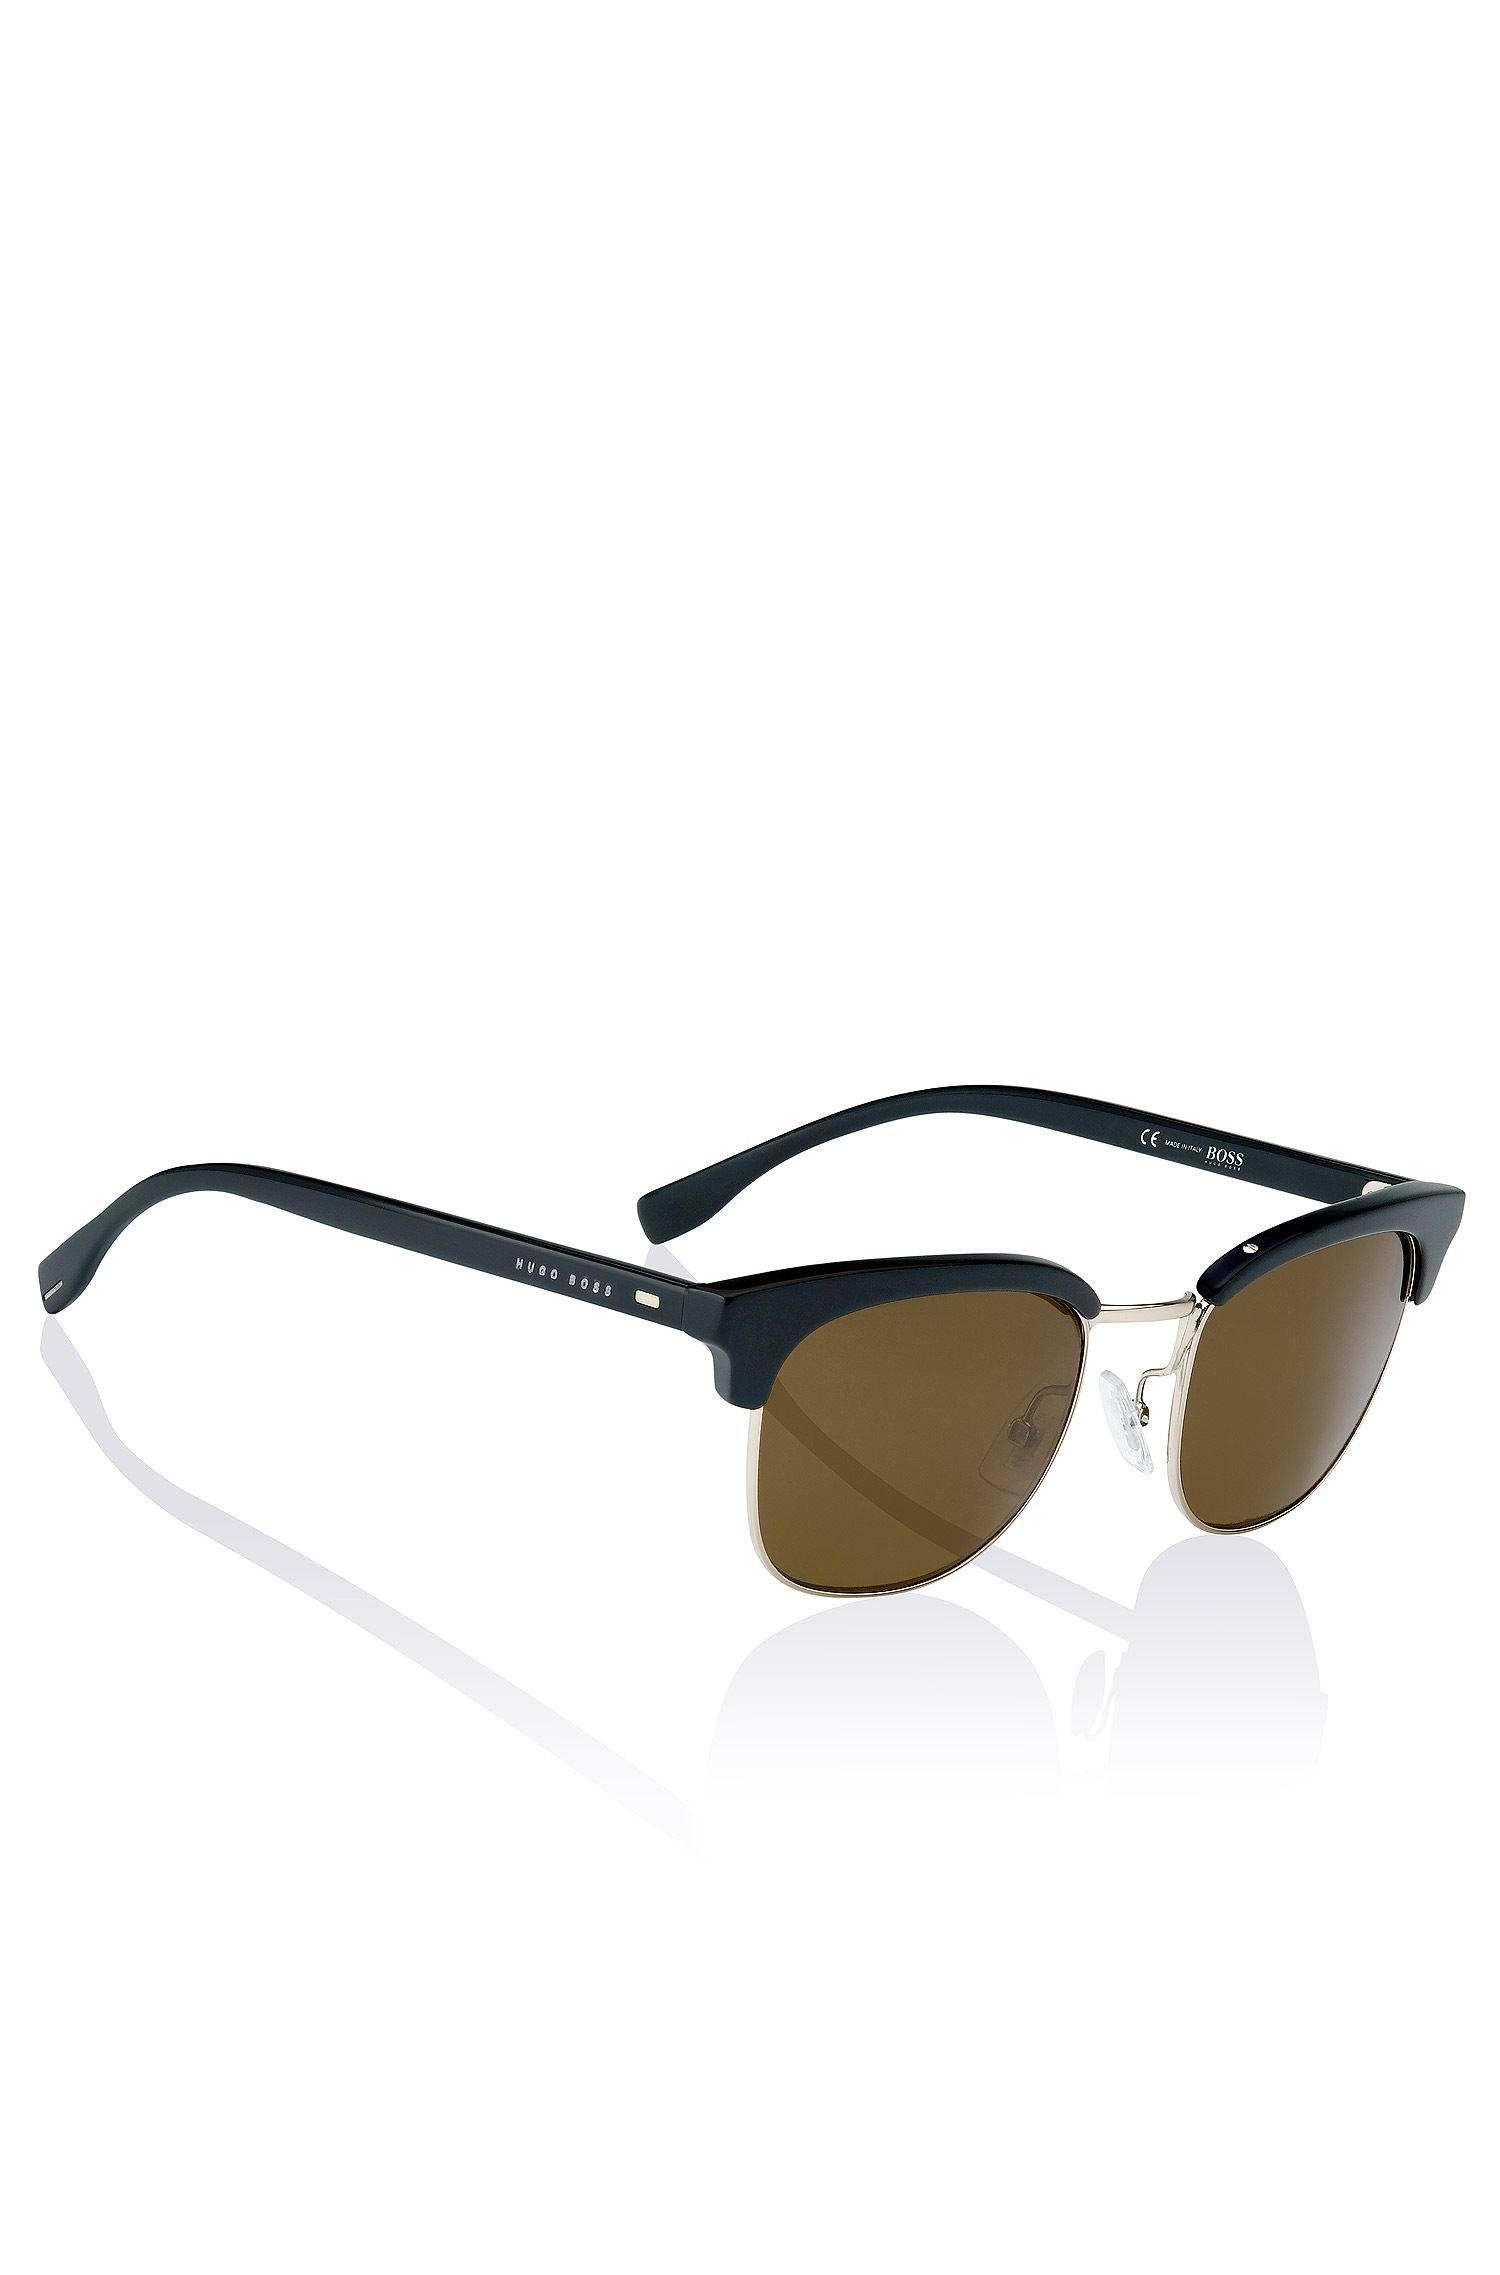 Clubmaster sunglasses 'BOSS 0667'